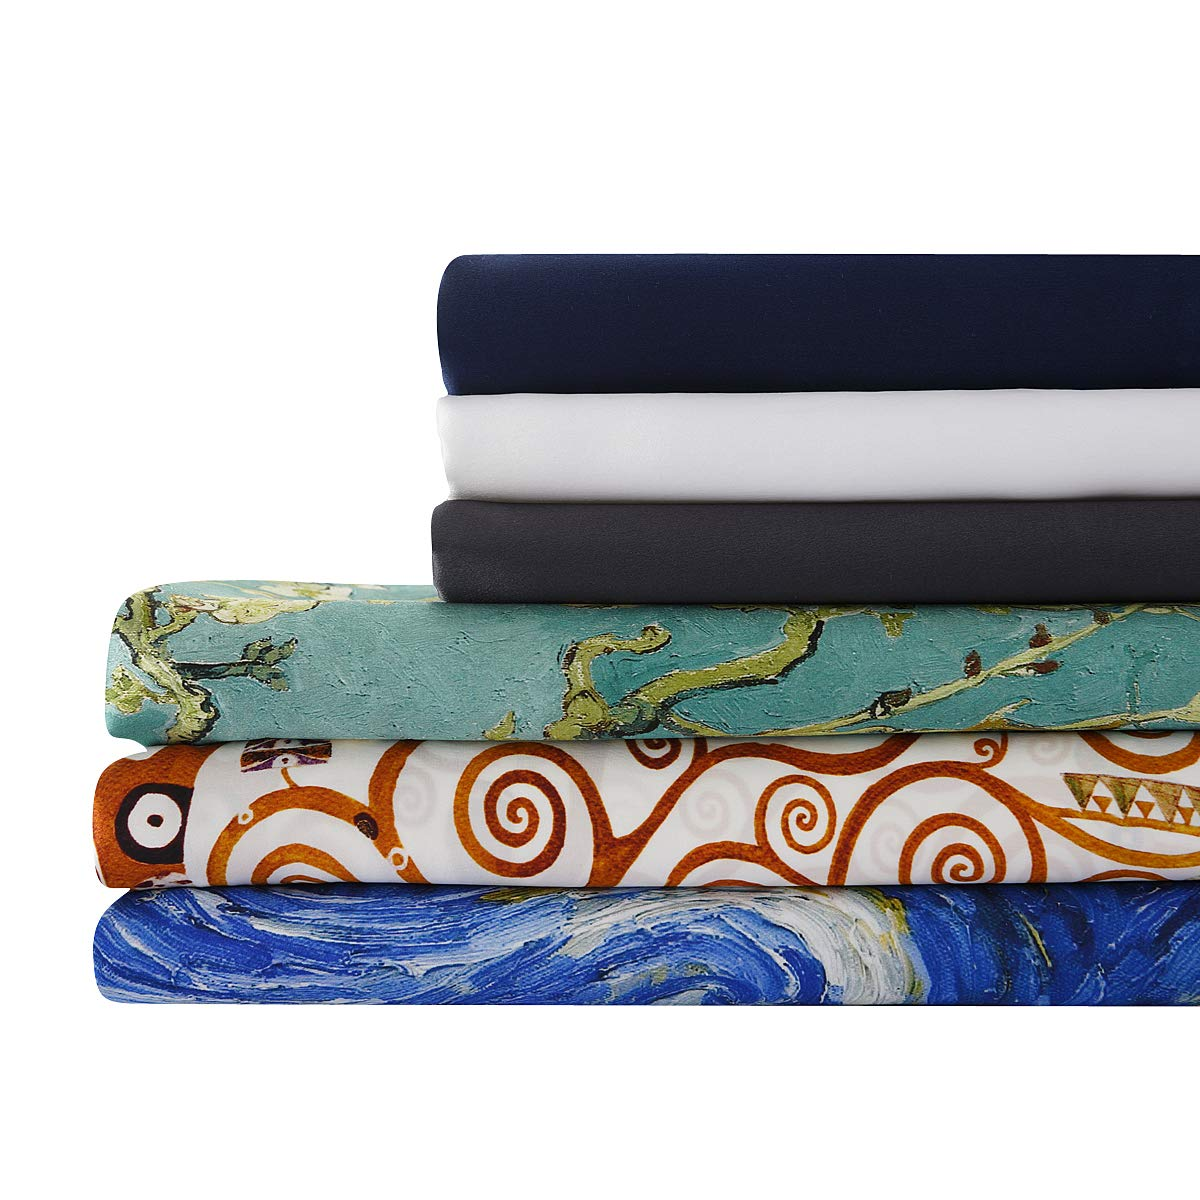 Starry Night 100/% seta di gelso 600/fili anallergica 19/momme ALASKA BEAR 50 x 75 cm federa per cuscino in seta naturale con cerniera nascosta Seta